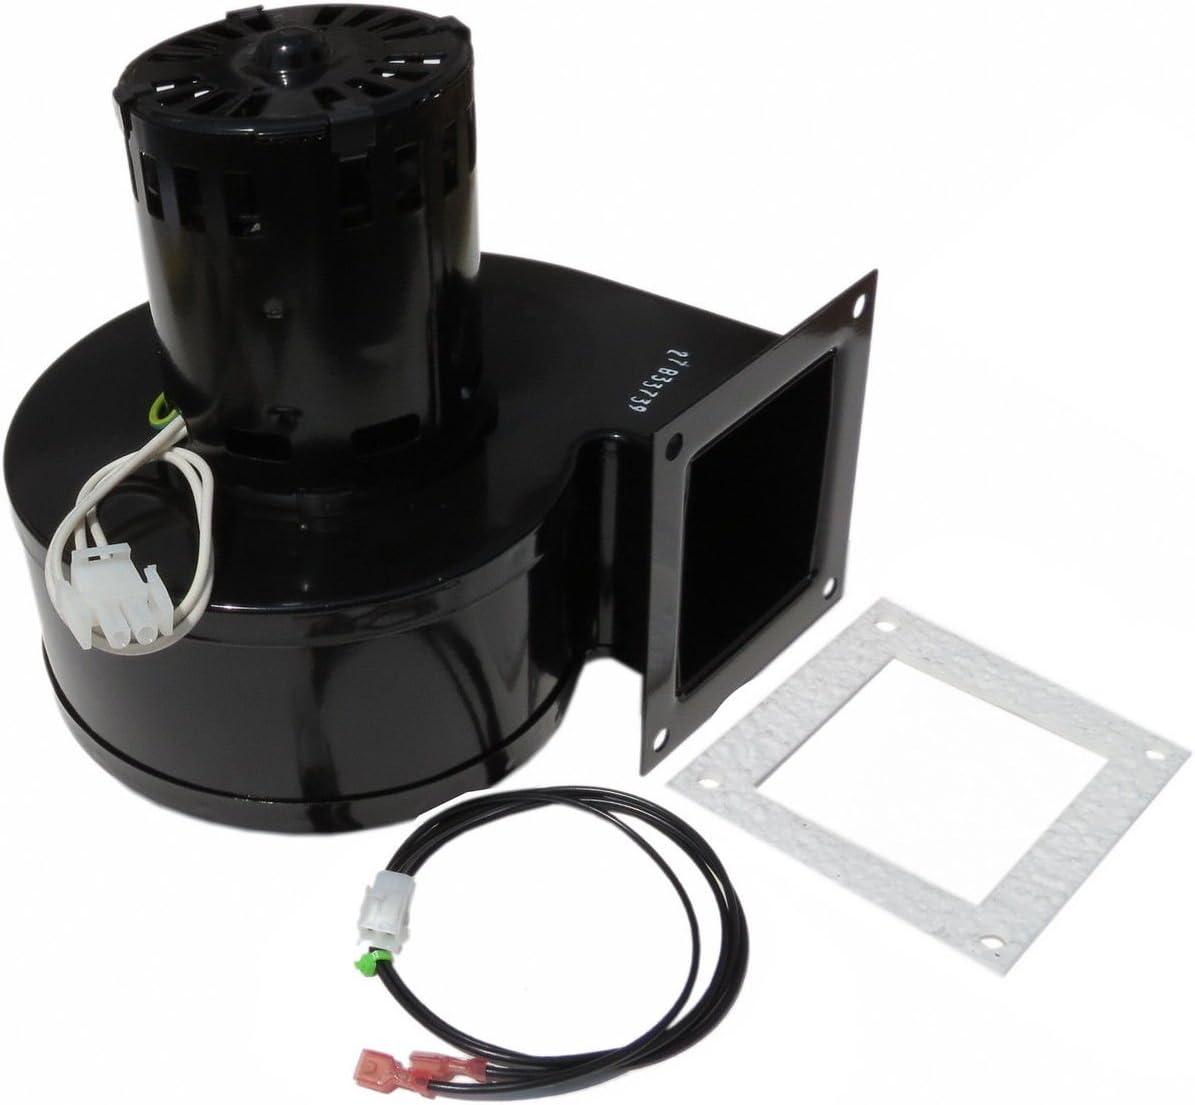 CRU Gear Shift Oil Seal Compatible with Suzuki 1971-77 TM250 TM400 1971-81 TS75 TS100 TS125